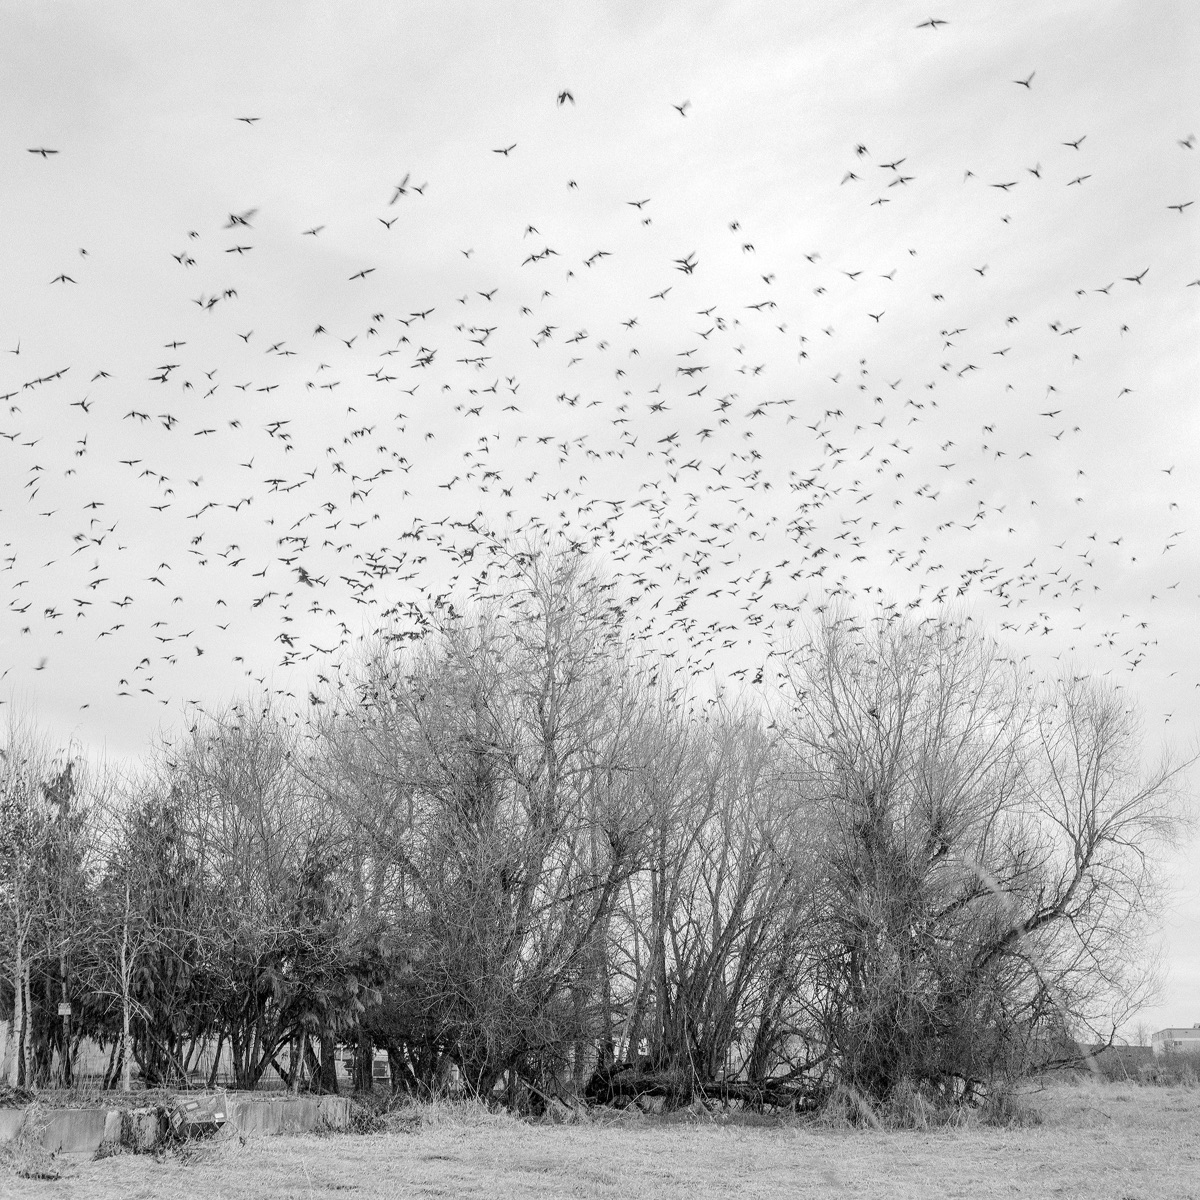 Interurban Crows Auburn, Washin - lasrfoto   ello